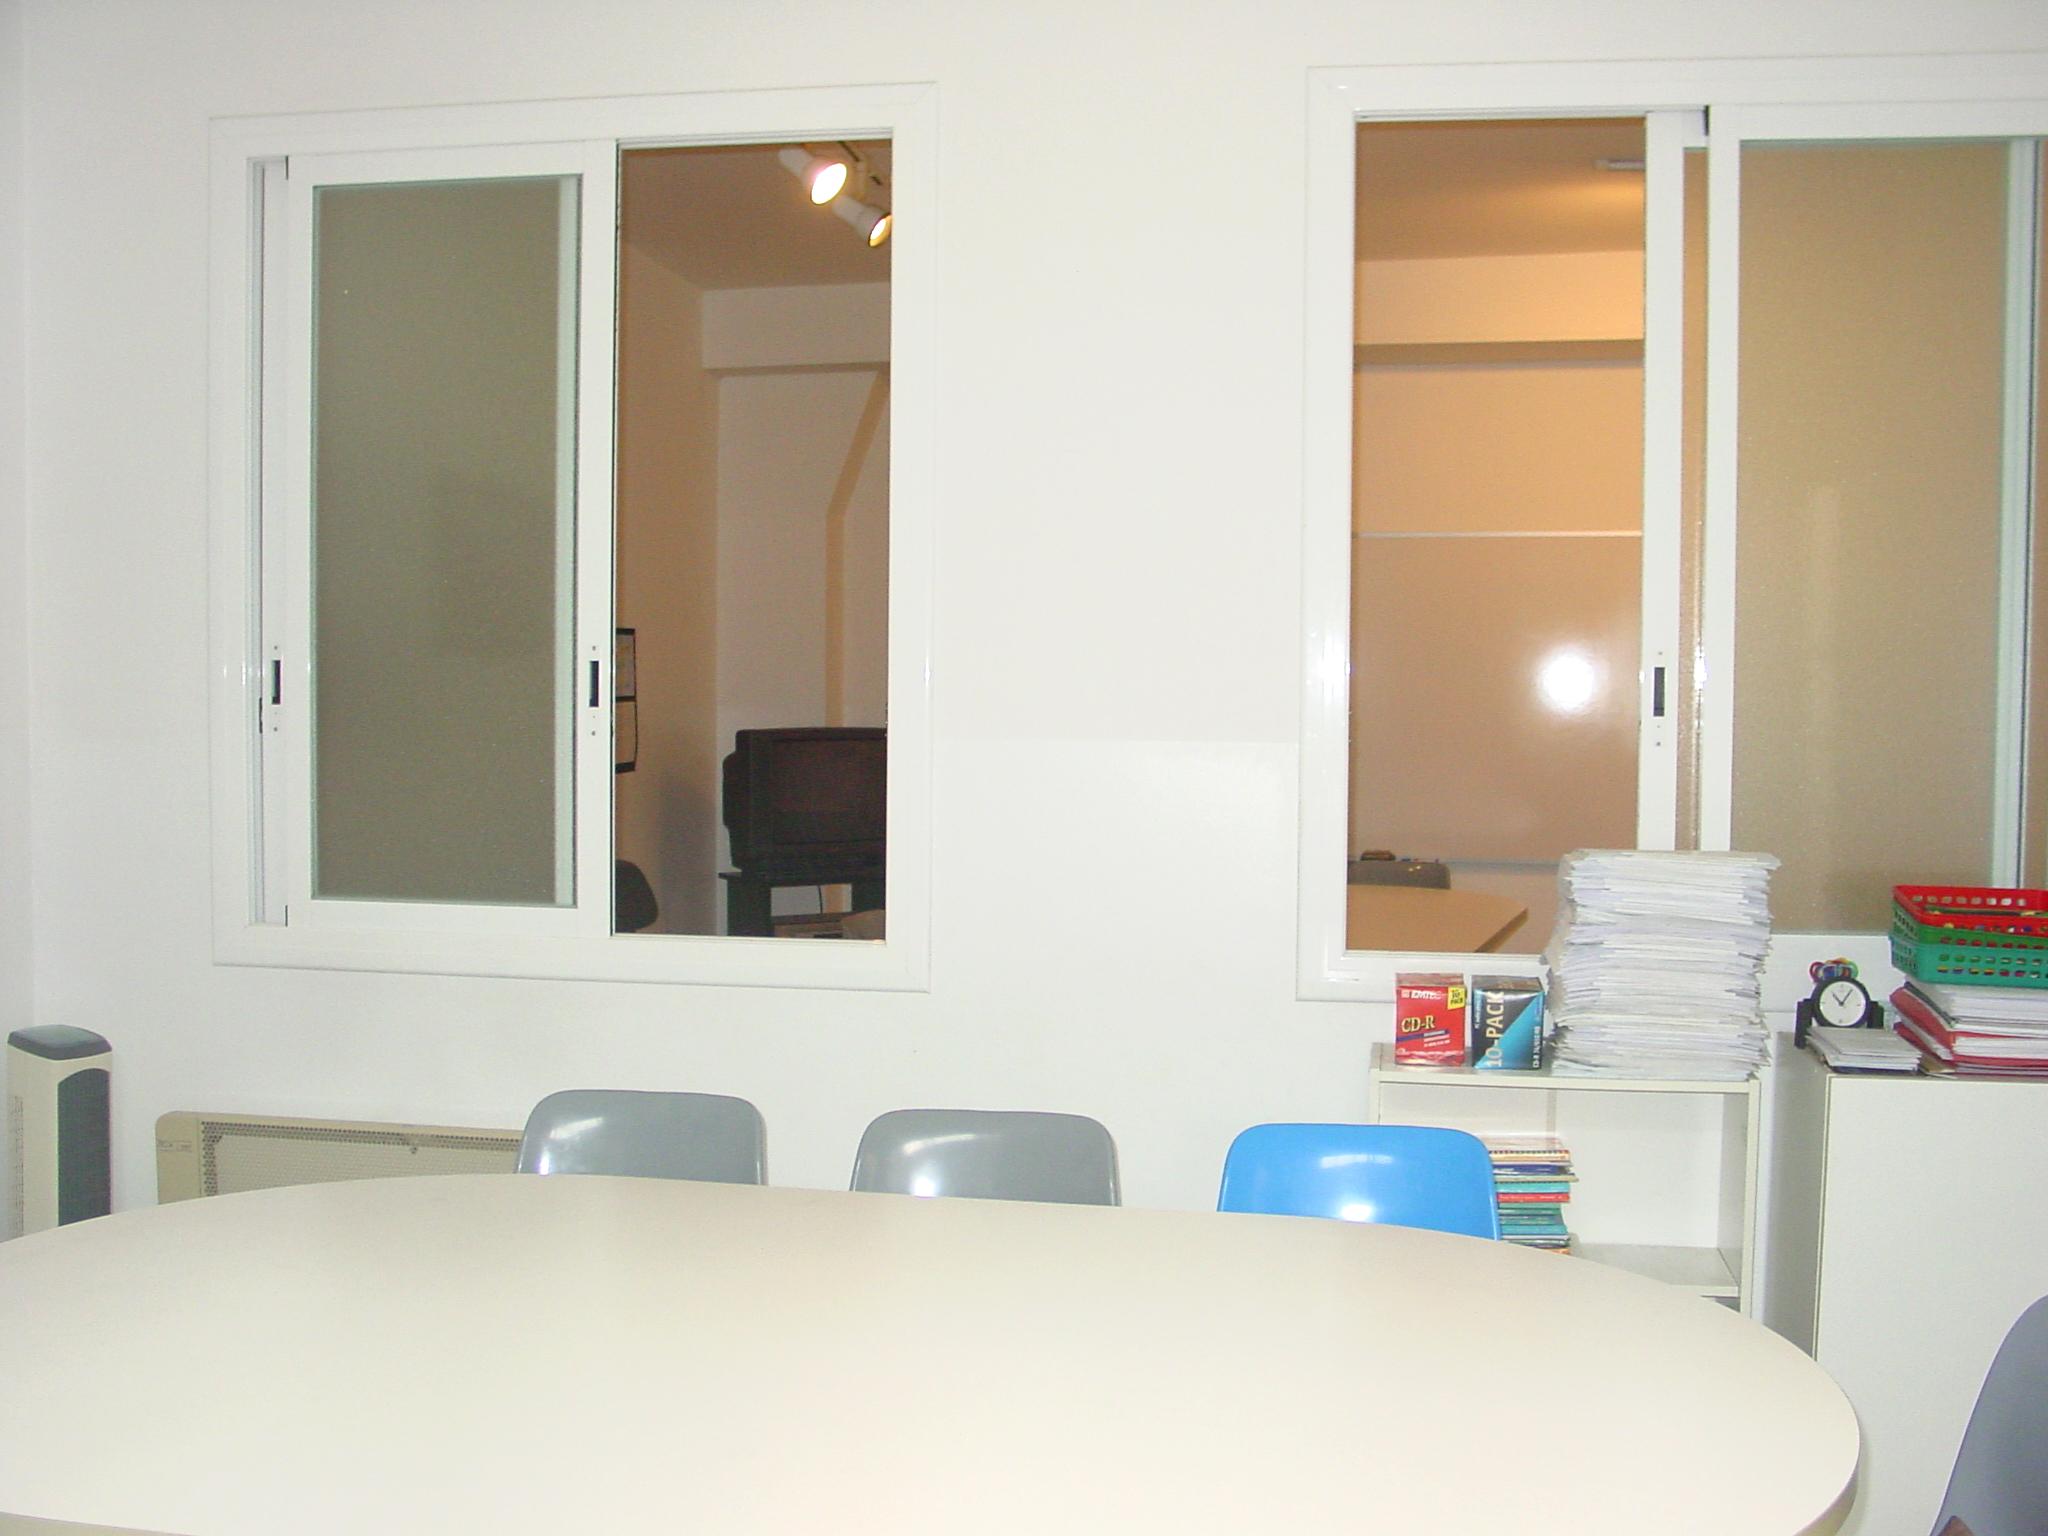 School picture 4